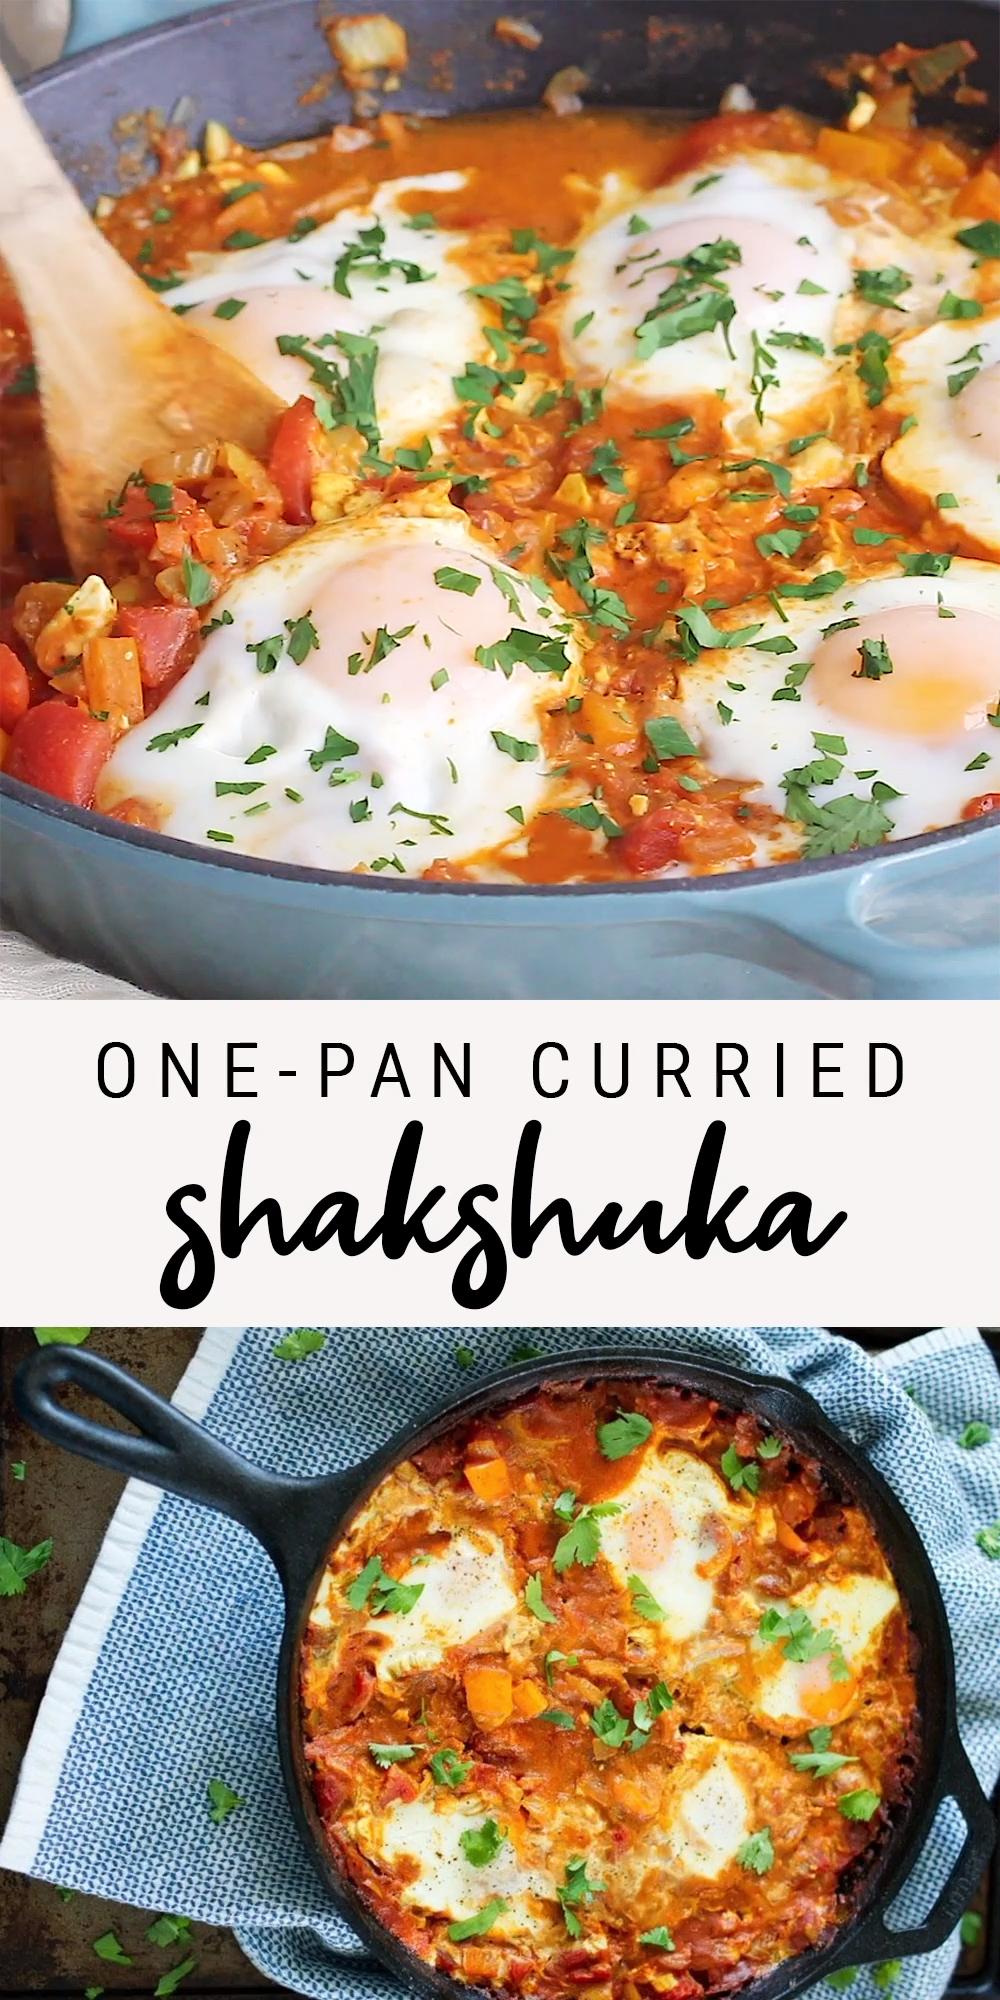 One-Pan Curried Shakshuka | Easy + Healthy Recipe